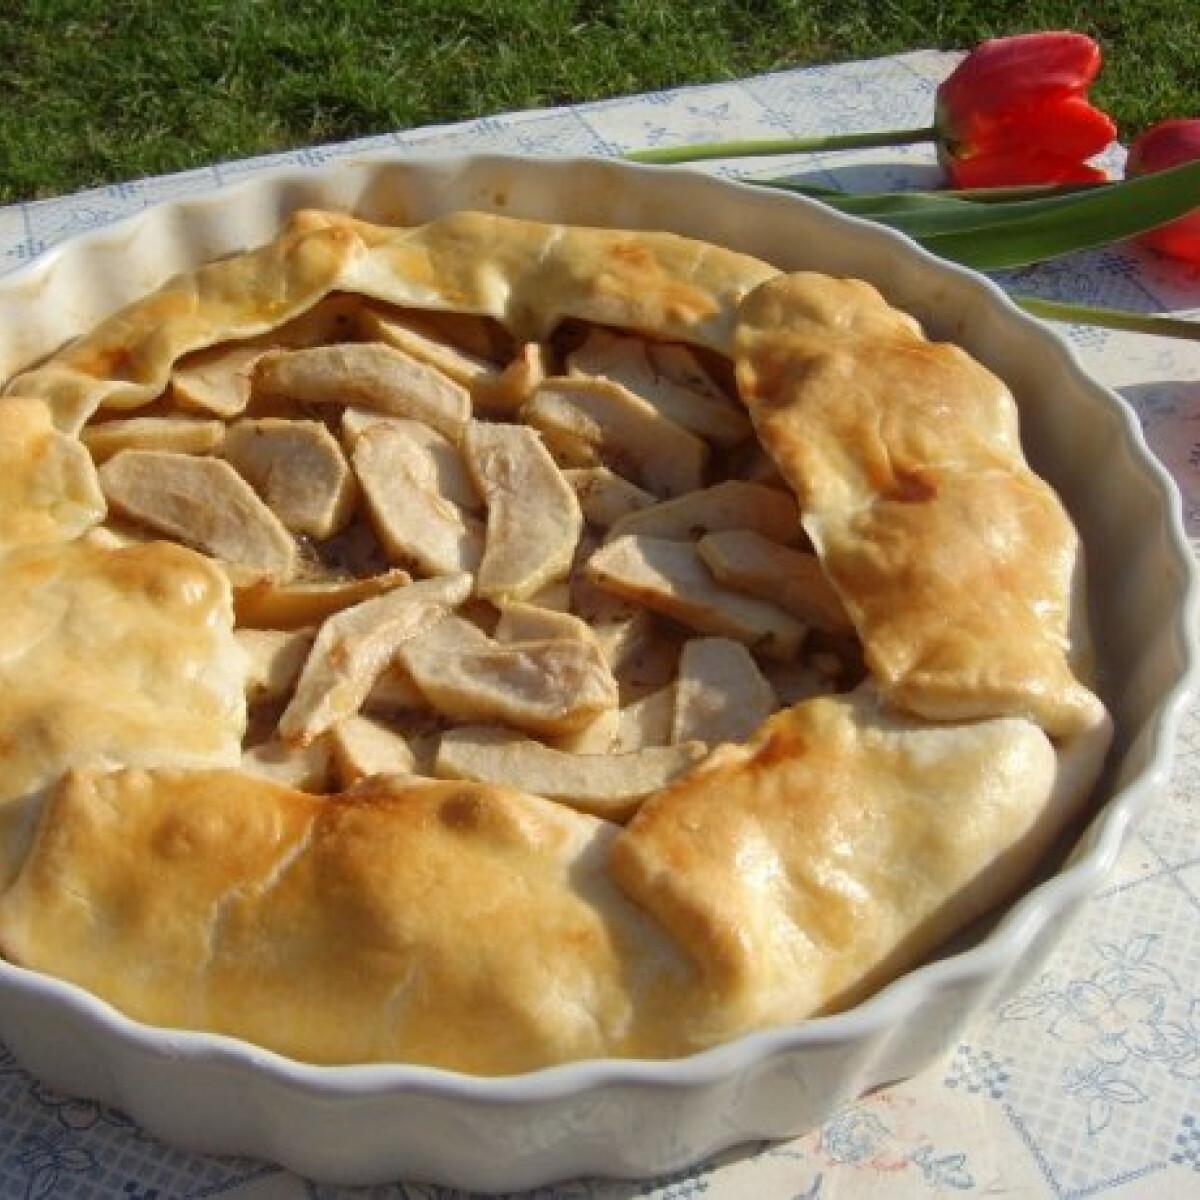 Kakukkfüves almás pite